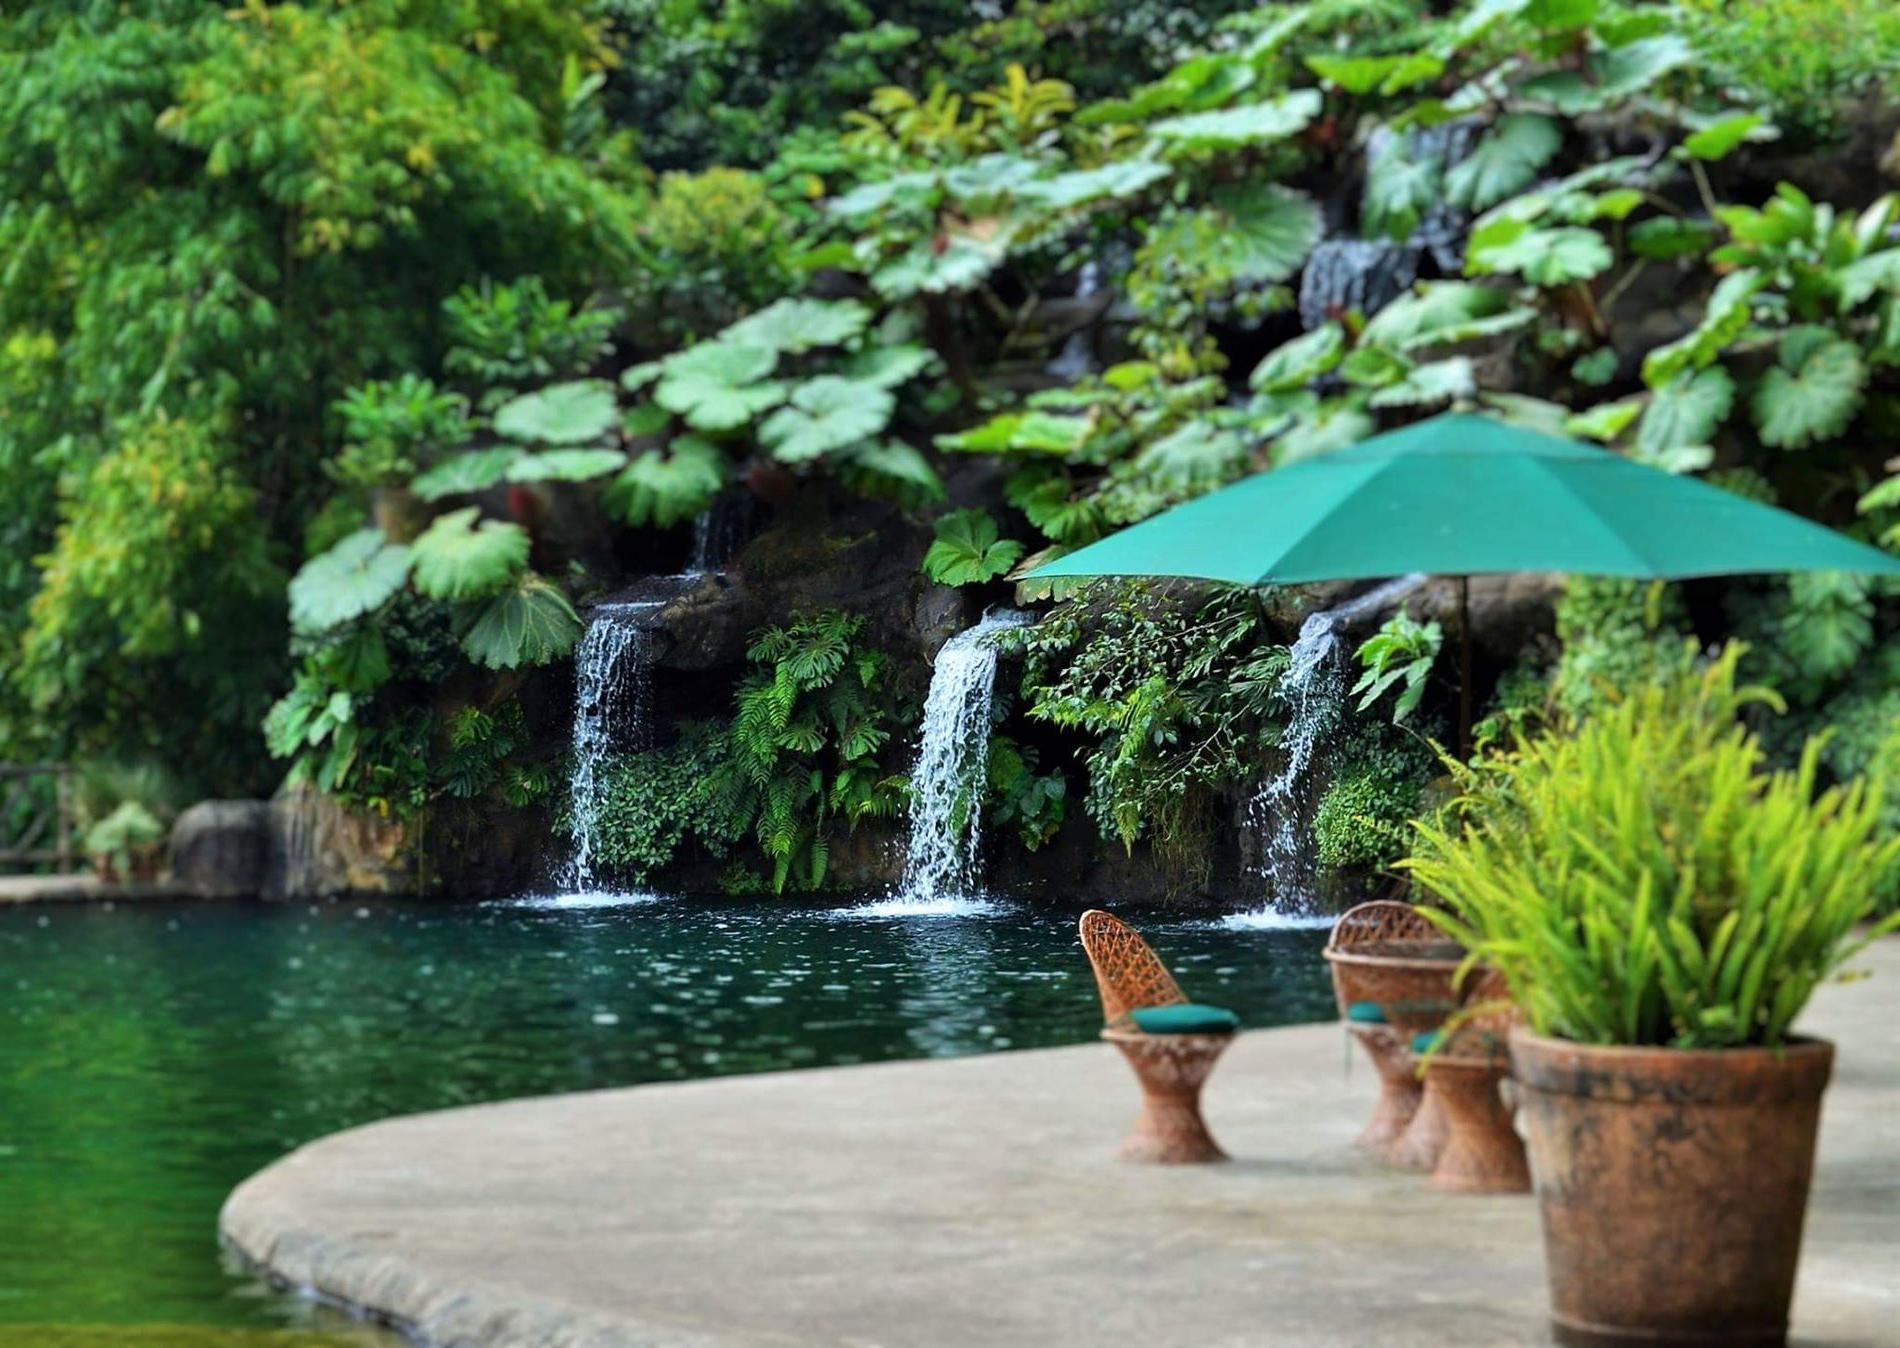 Bonville Ceramic Garden Stools Pertaining To Best And Newest Https://gurushots/photo/ 2018 02 21t08:42:02+00: (View 28 of 30)